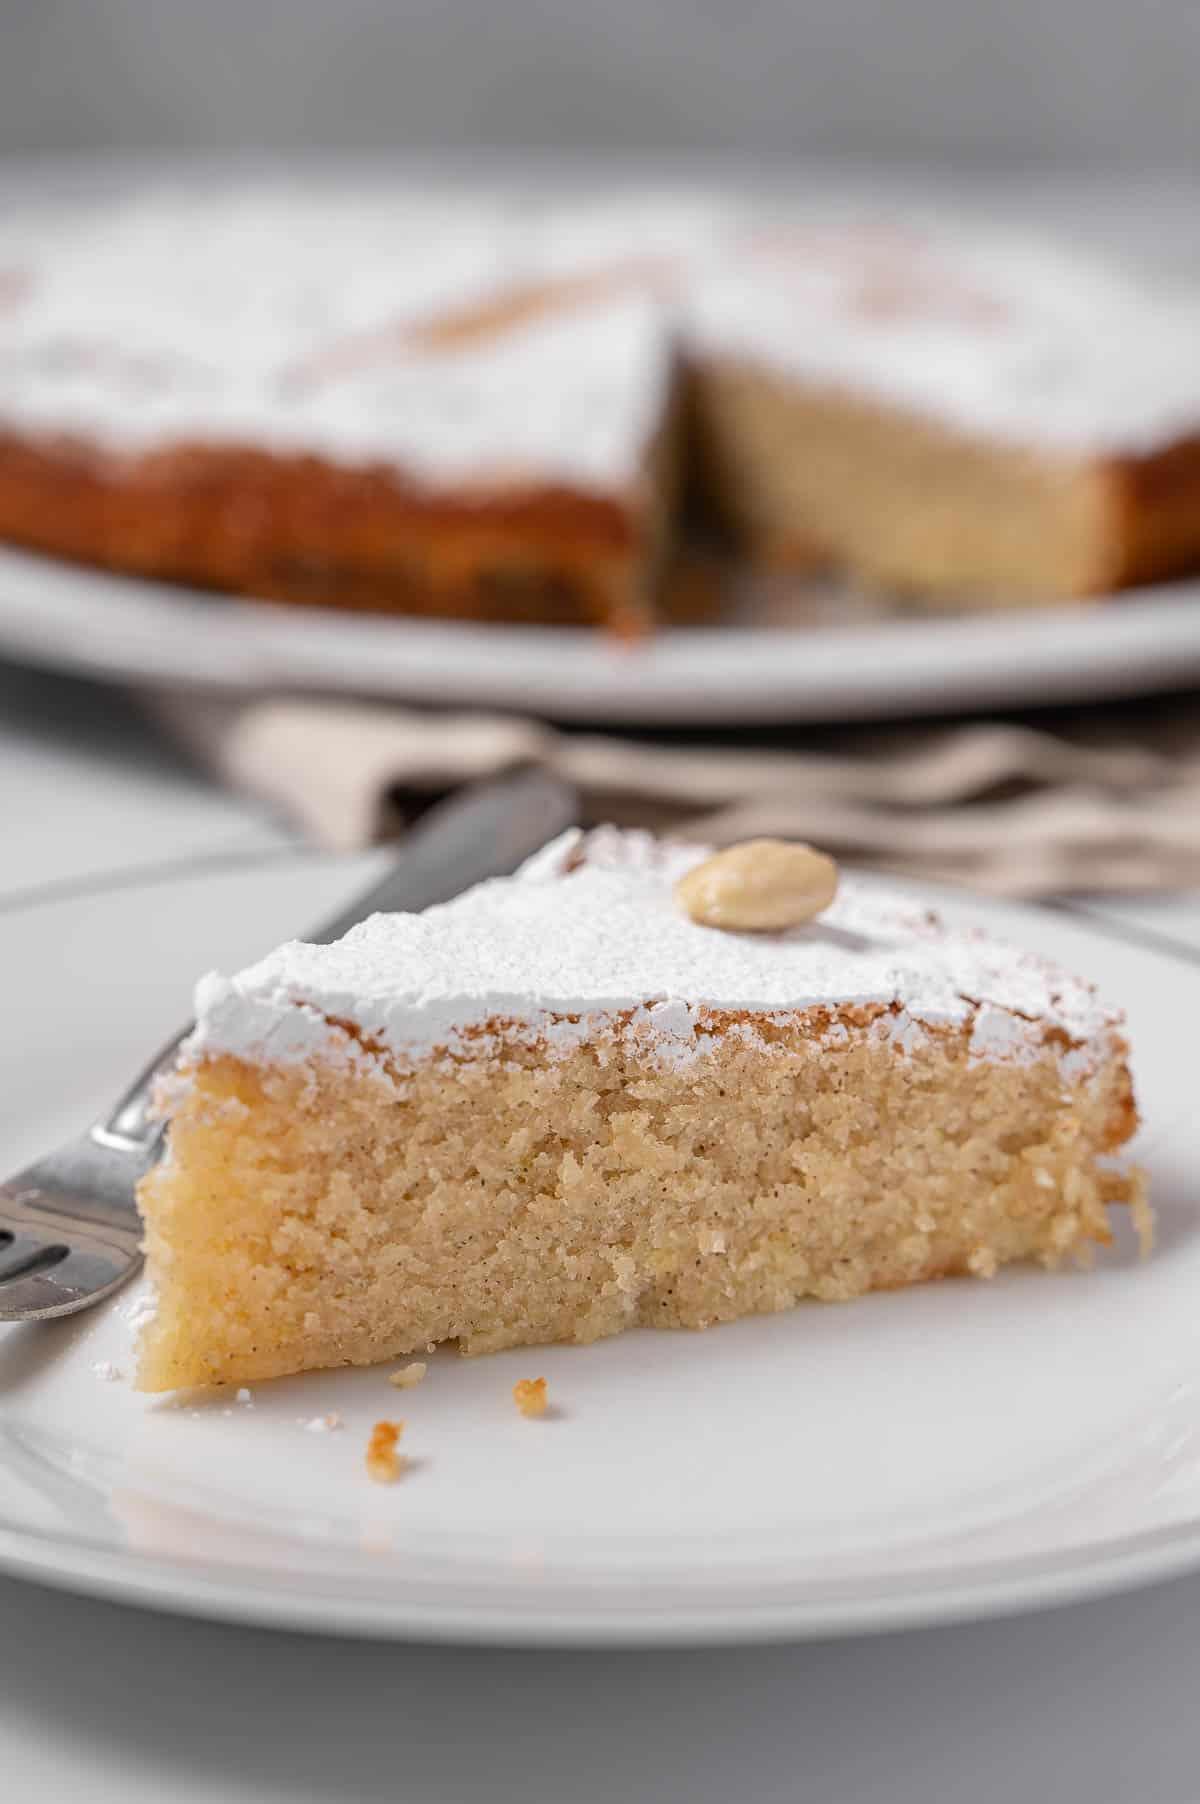 A delicious Tarta de Santiago recipe for the famous Spanish almond cake.